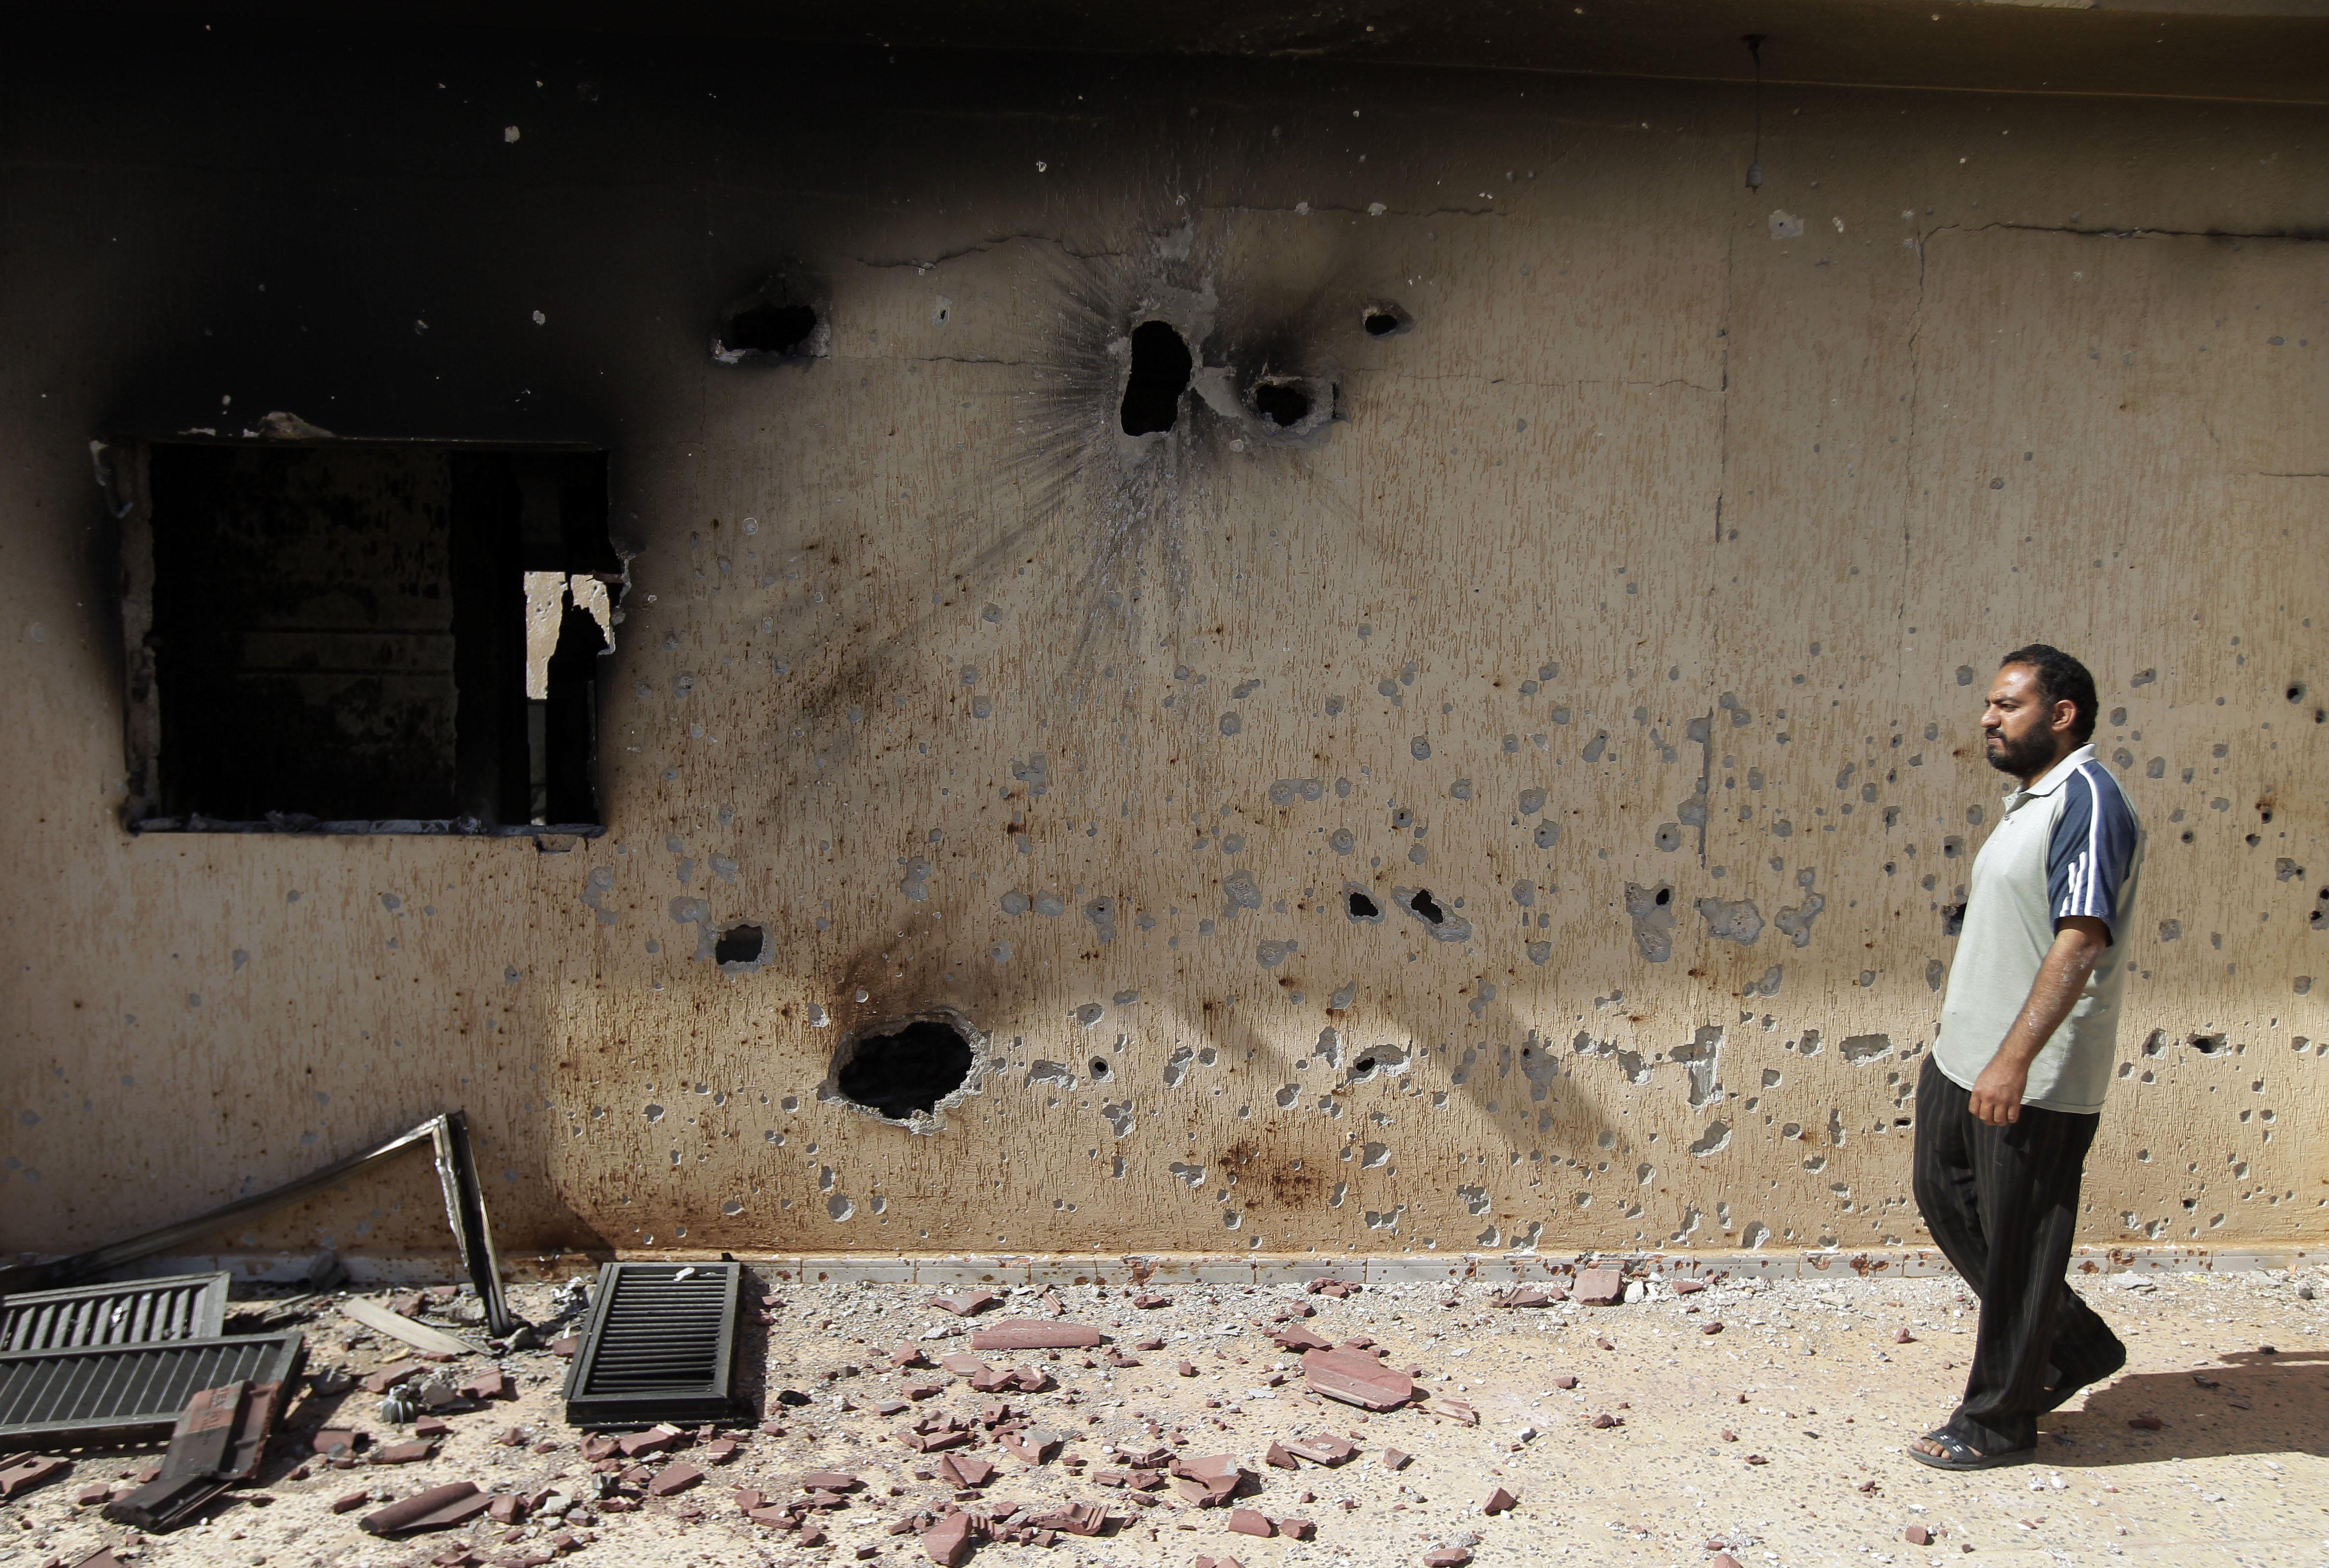 Damaged house in Sirte, Libya